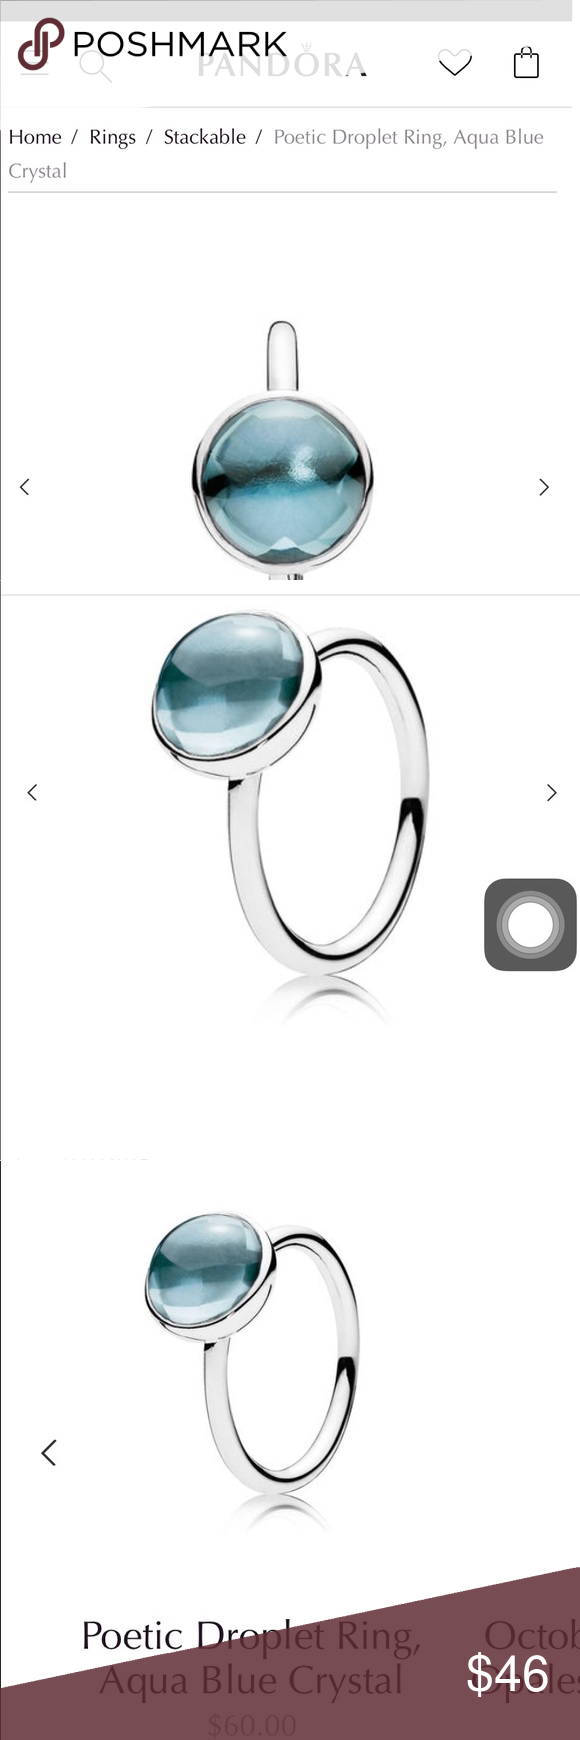 22e75fe21 NWT Pandora Poetic Droplet Ring sz 51/2 beautiful Pandora Poetic Droplet  Ring purchased at Kathies Boutique beautiful Pandora Jewelry Rings